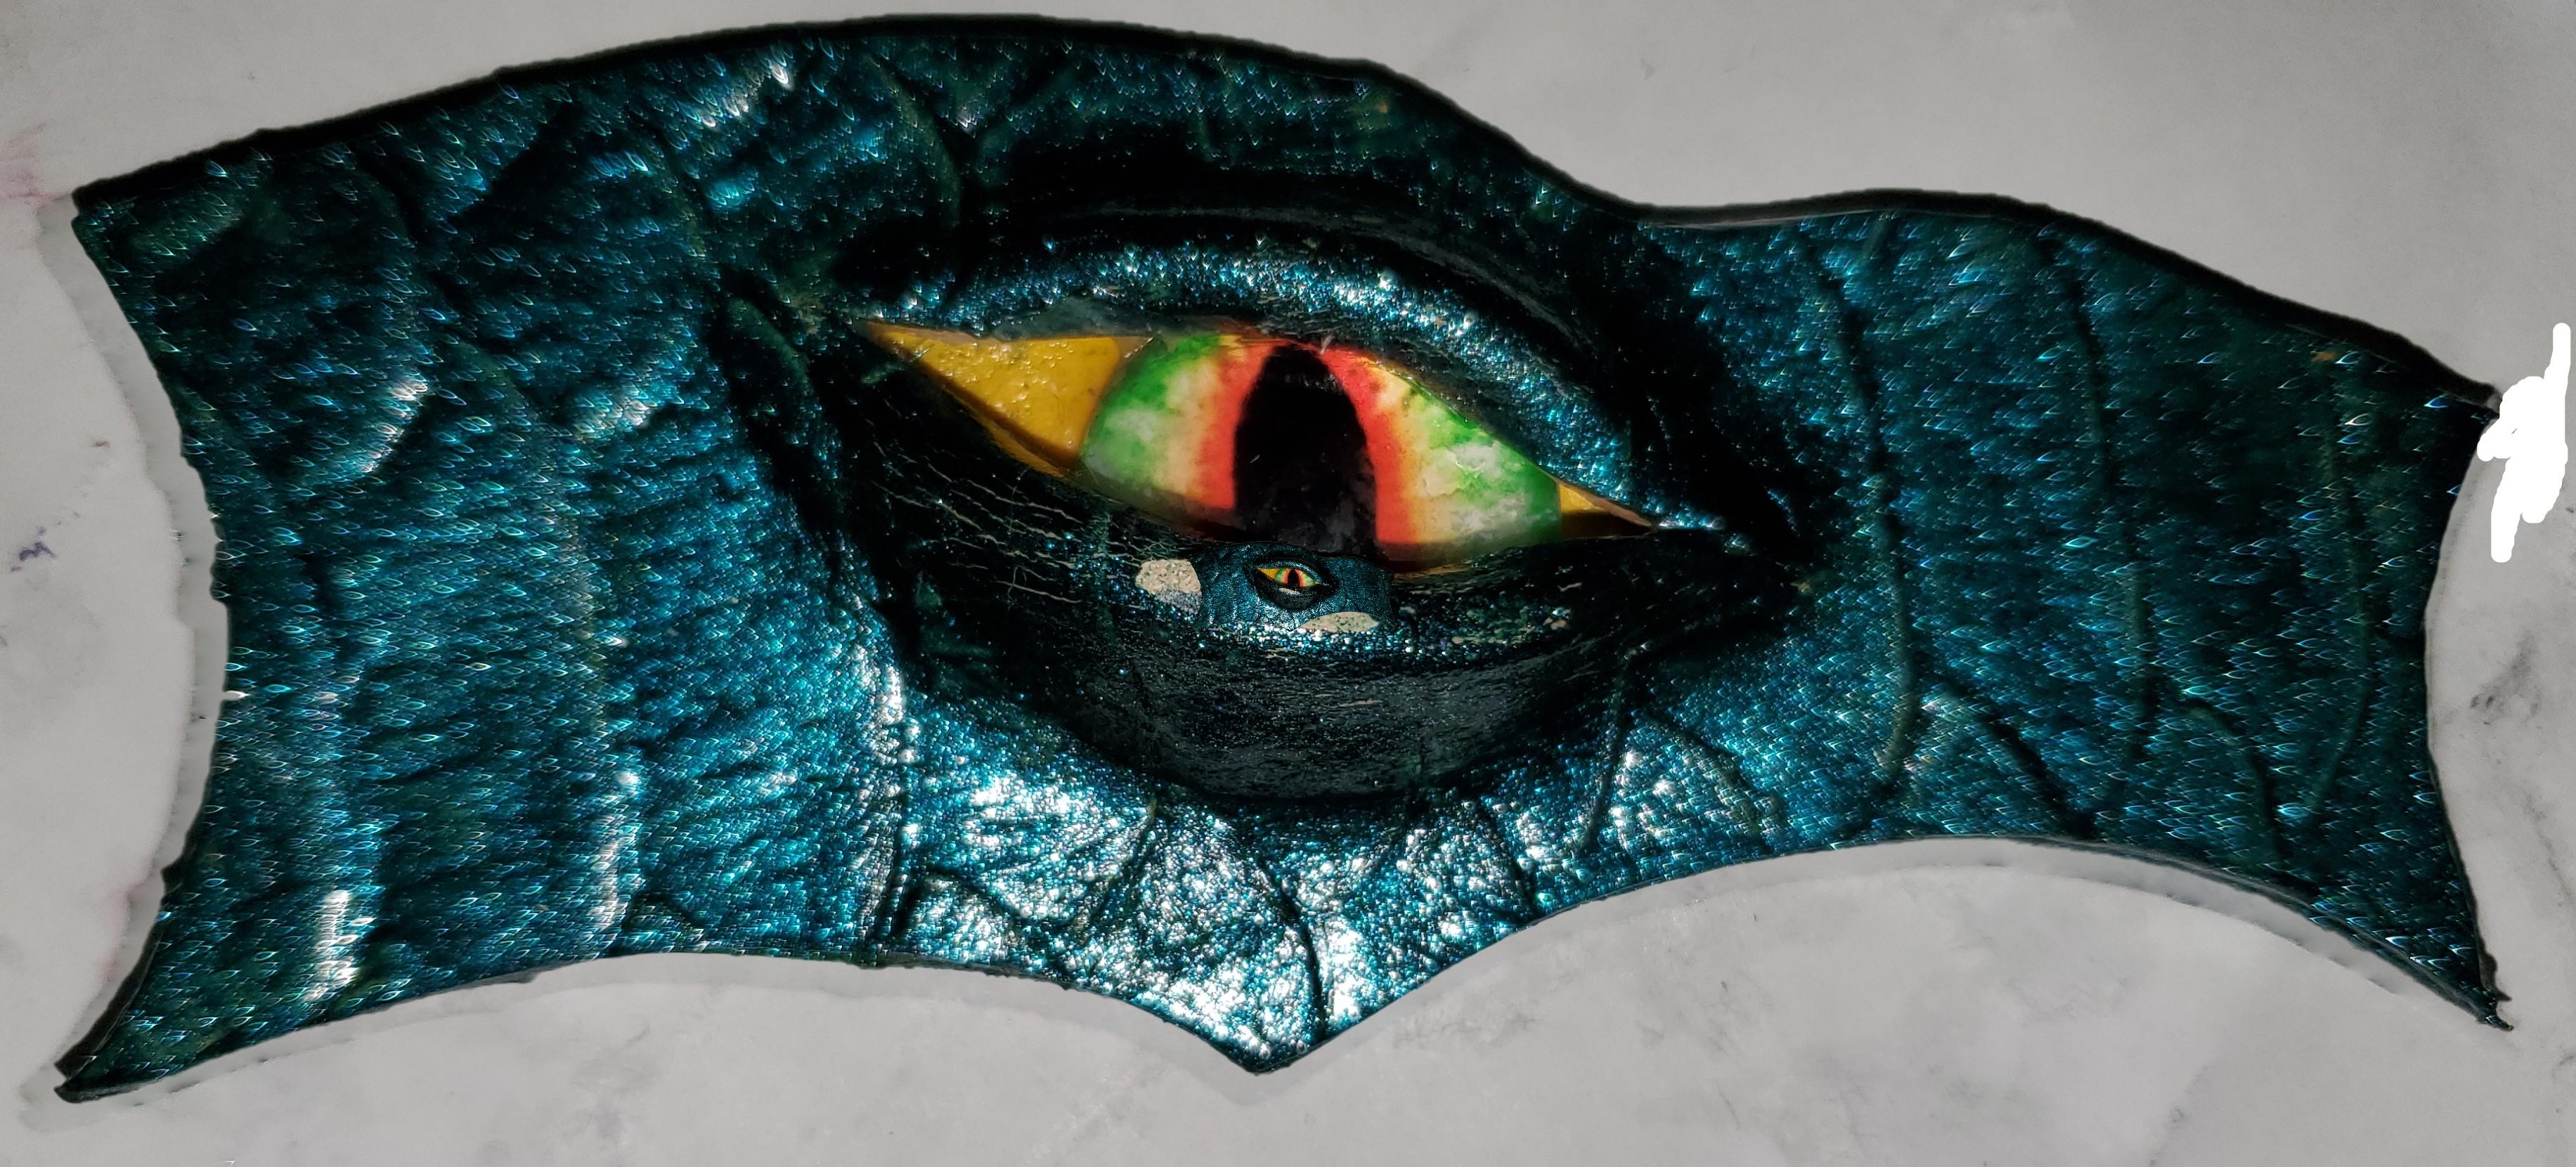 Dragon eyeZ